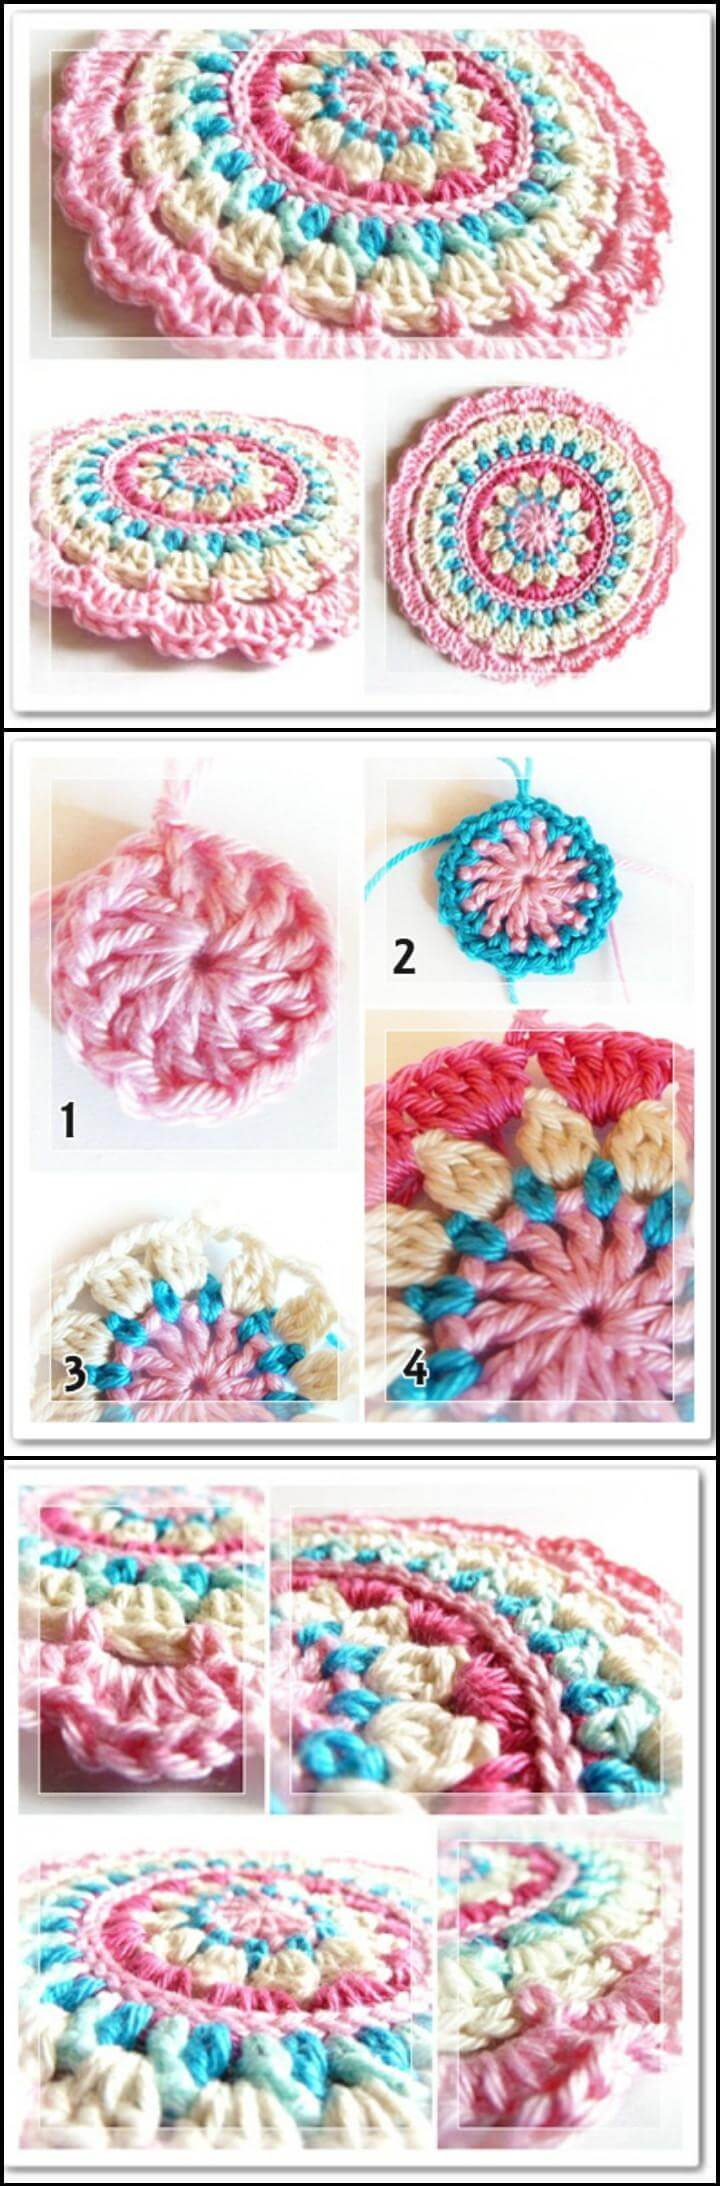 mandala de crochet pequeña primavera